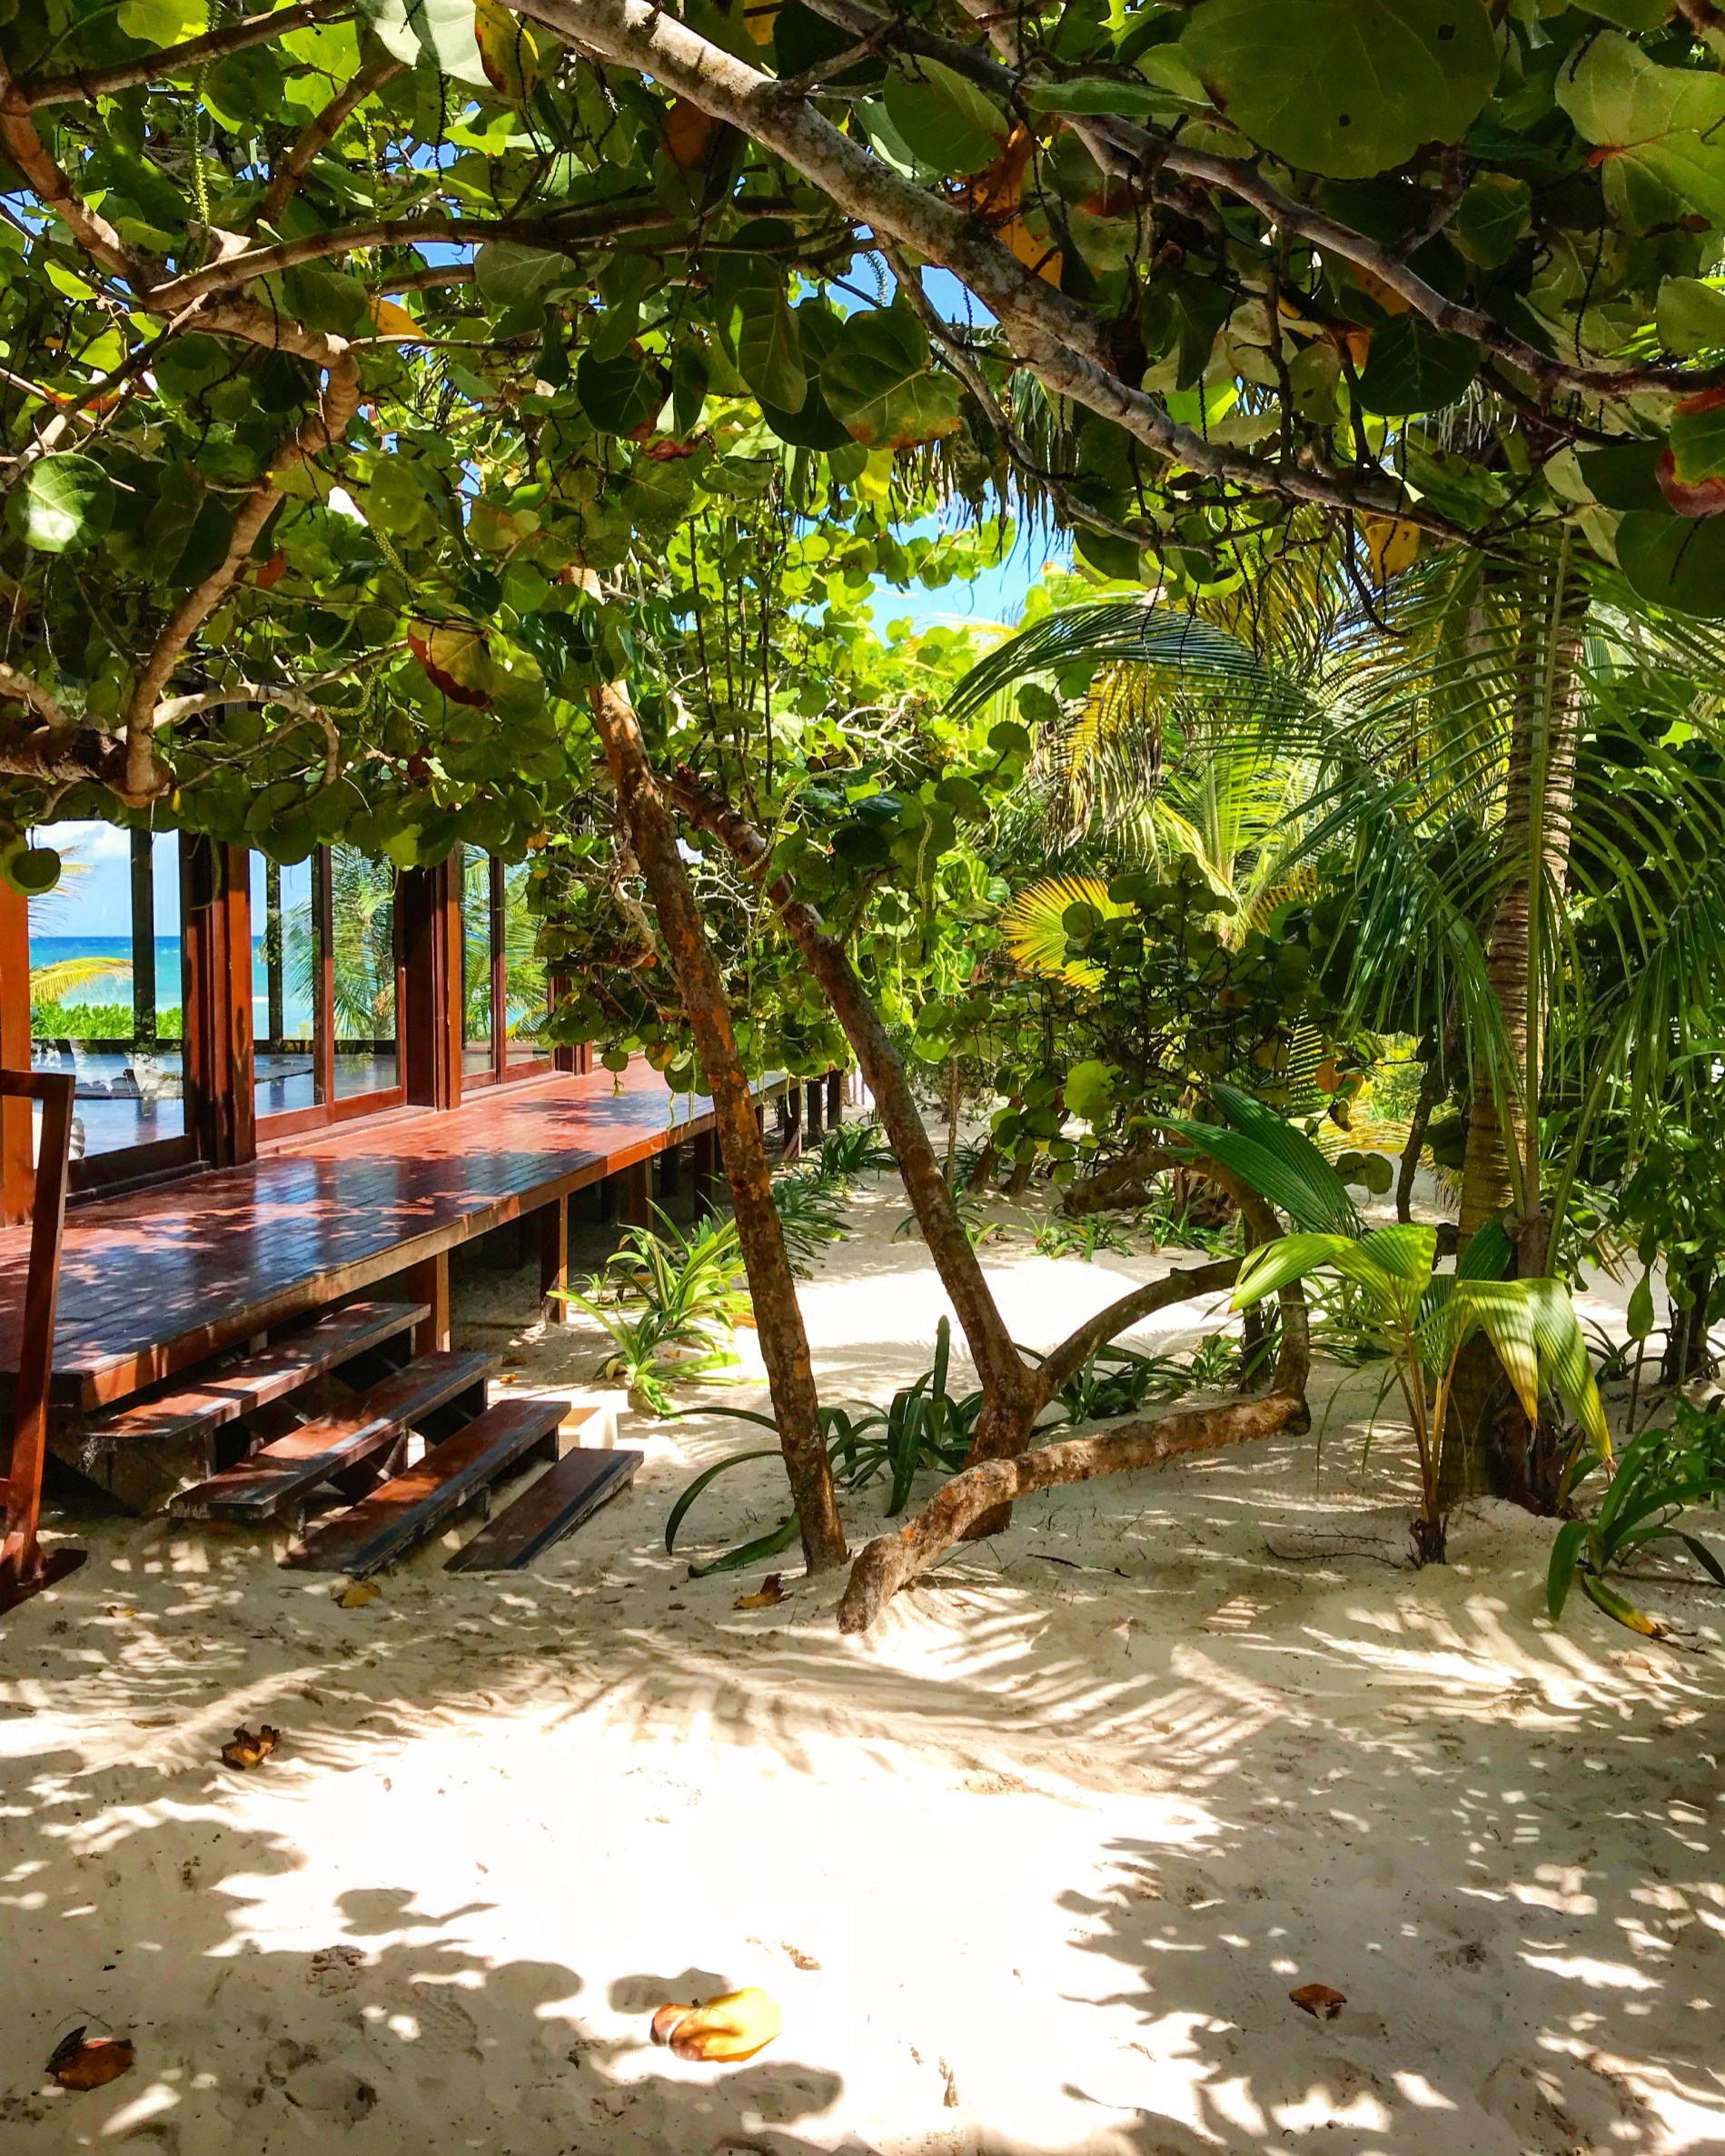 Luxury Hotels of the World: Sanará Hotel in Tulum Mexico Riviera Maya Caribbean Sea